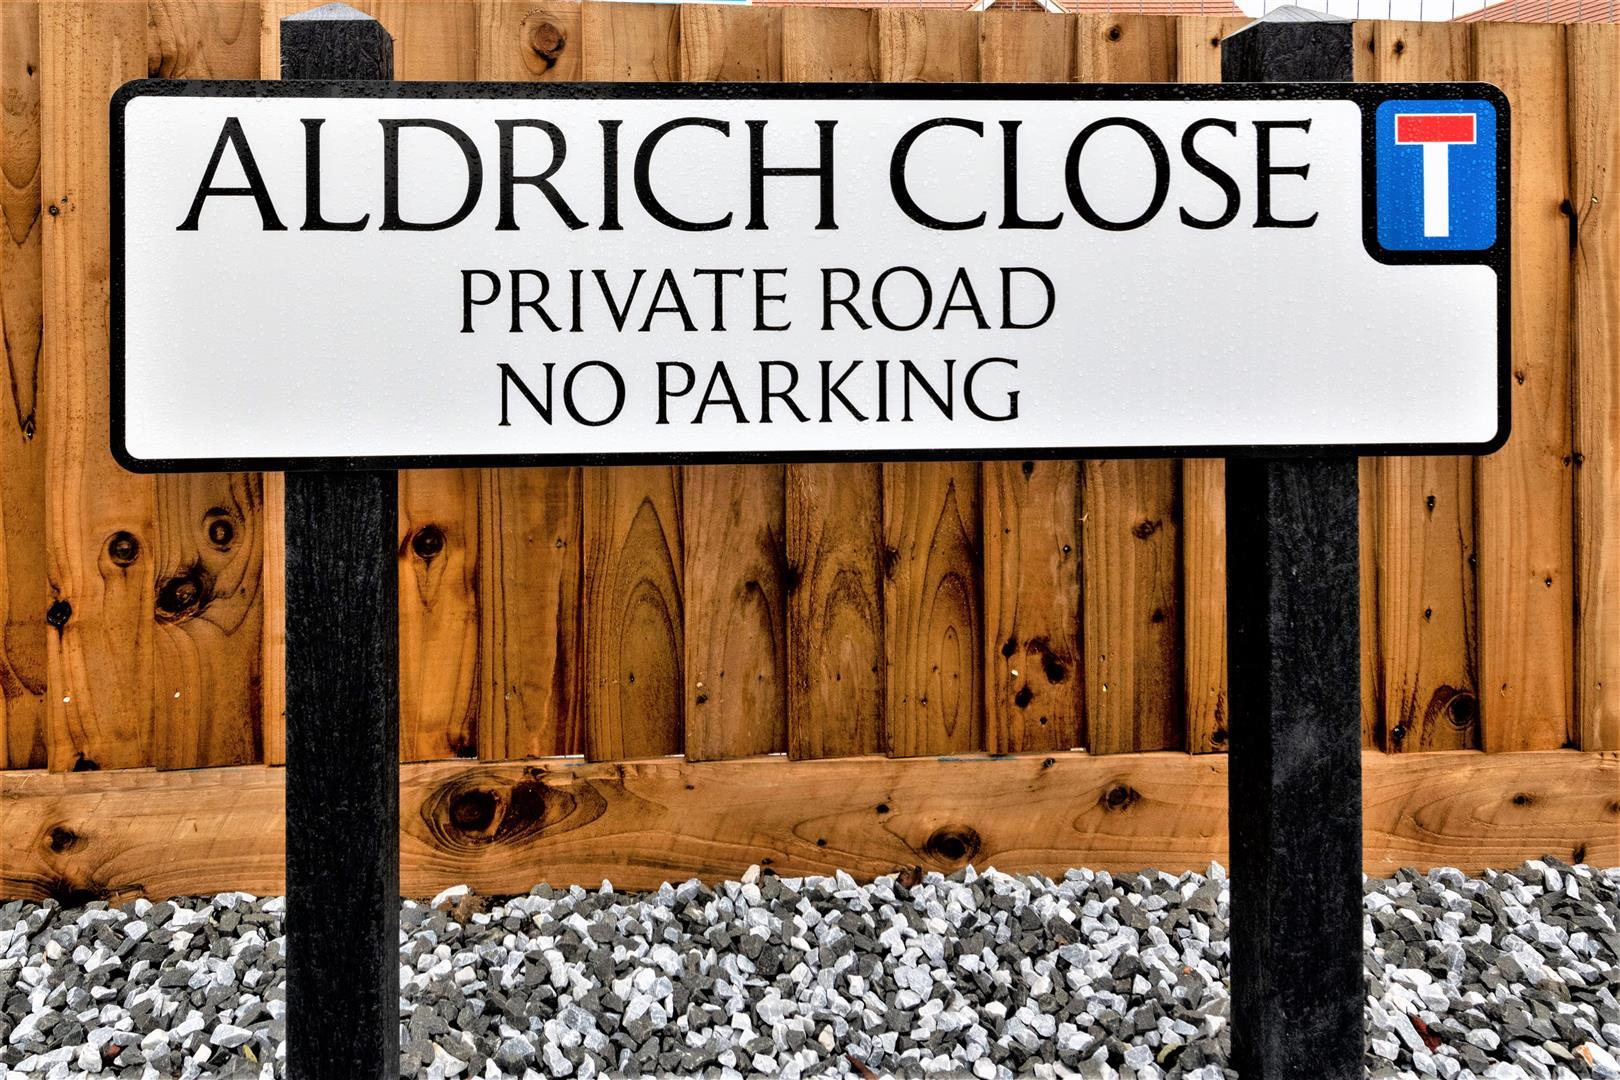 Aldrich Close, Kirby Cross, Essex, CO13 0LX